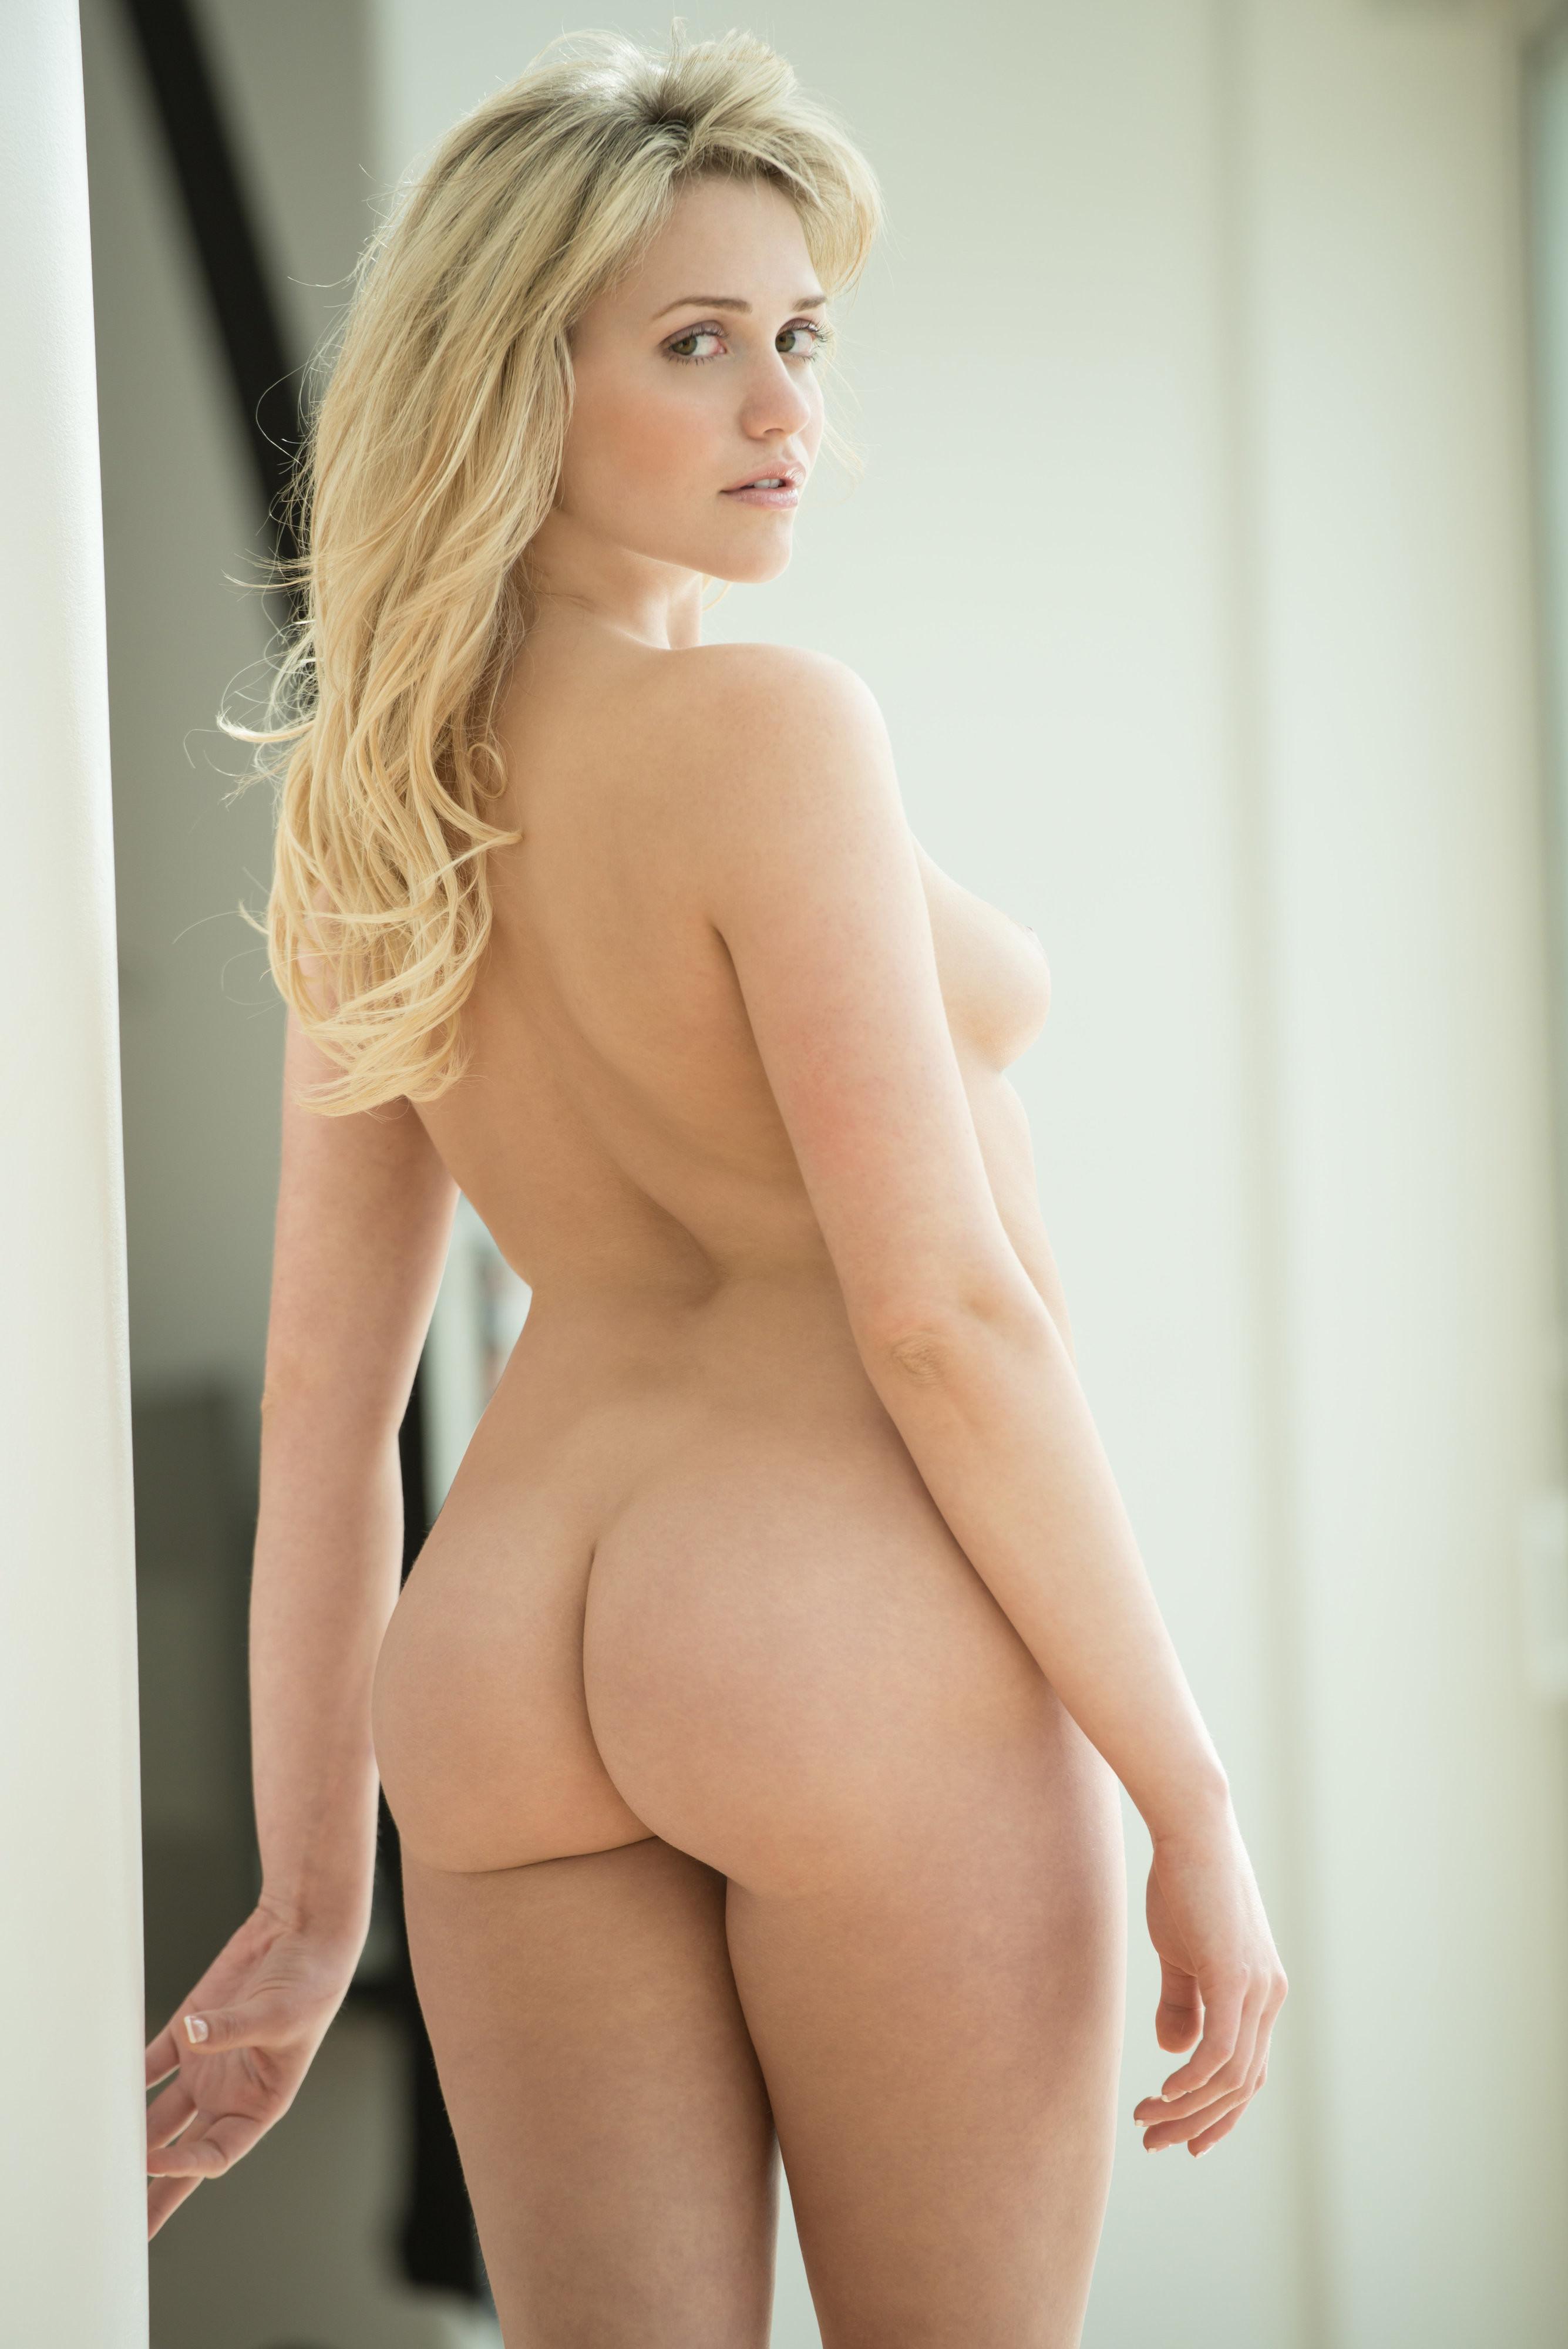 Mia Malkova Butt